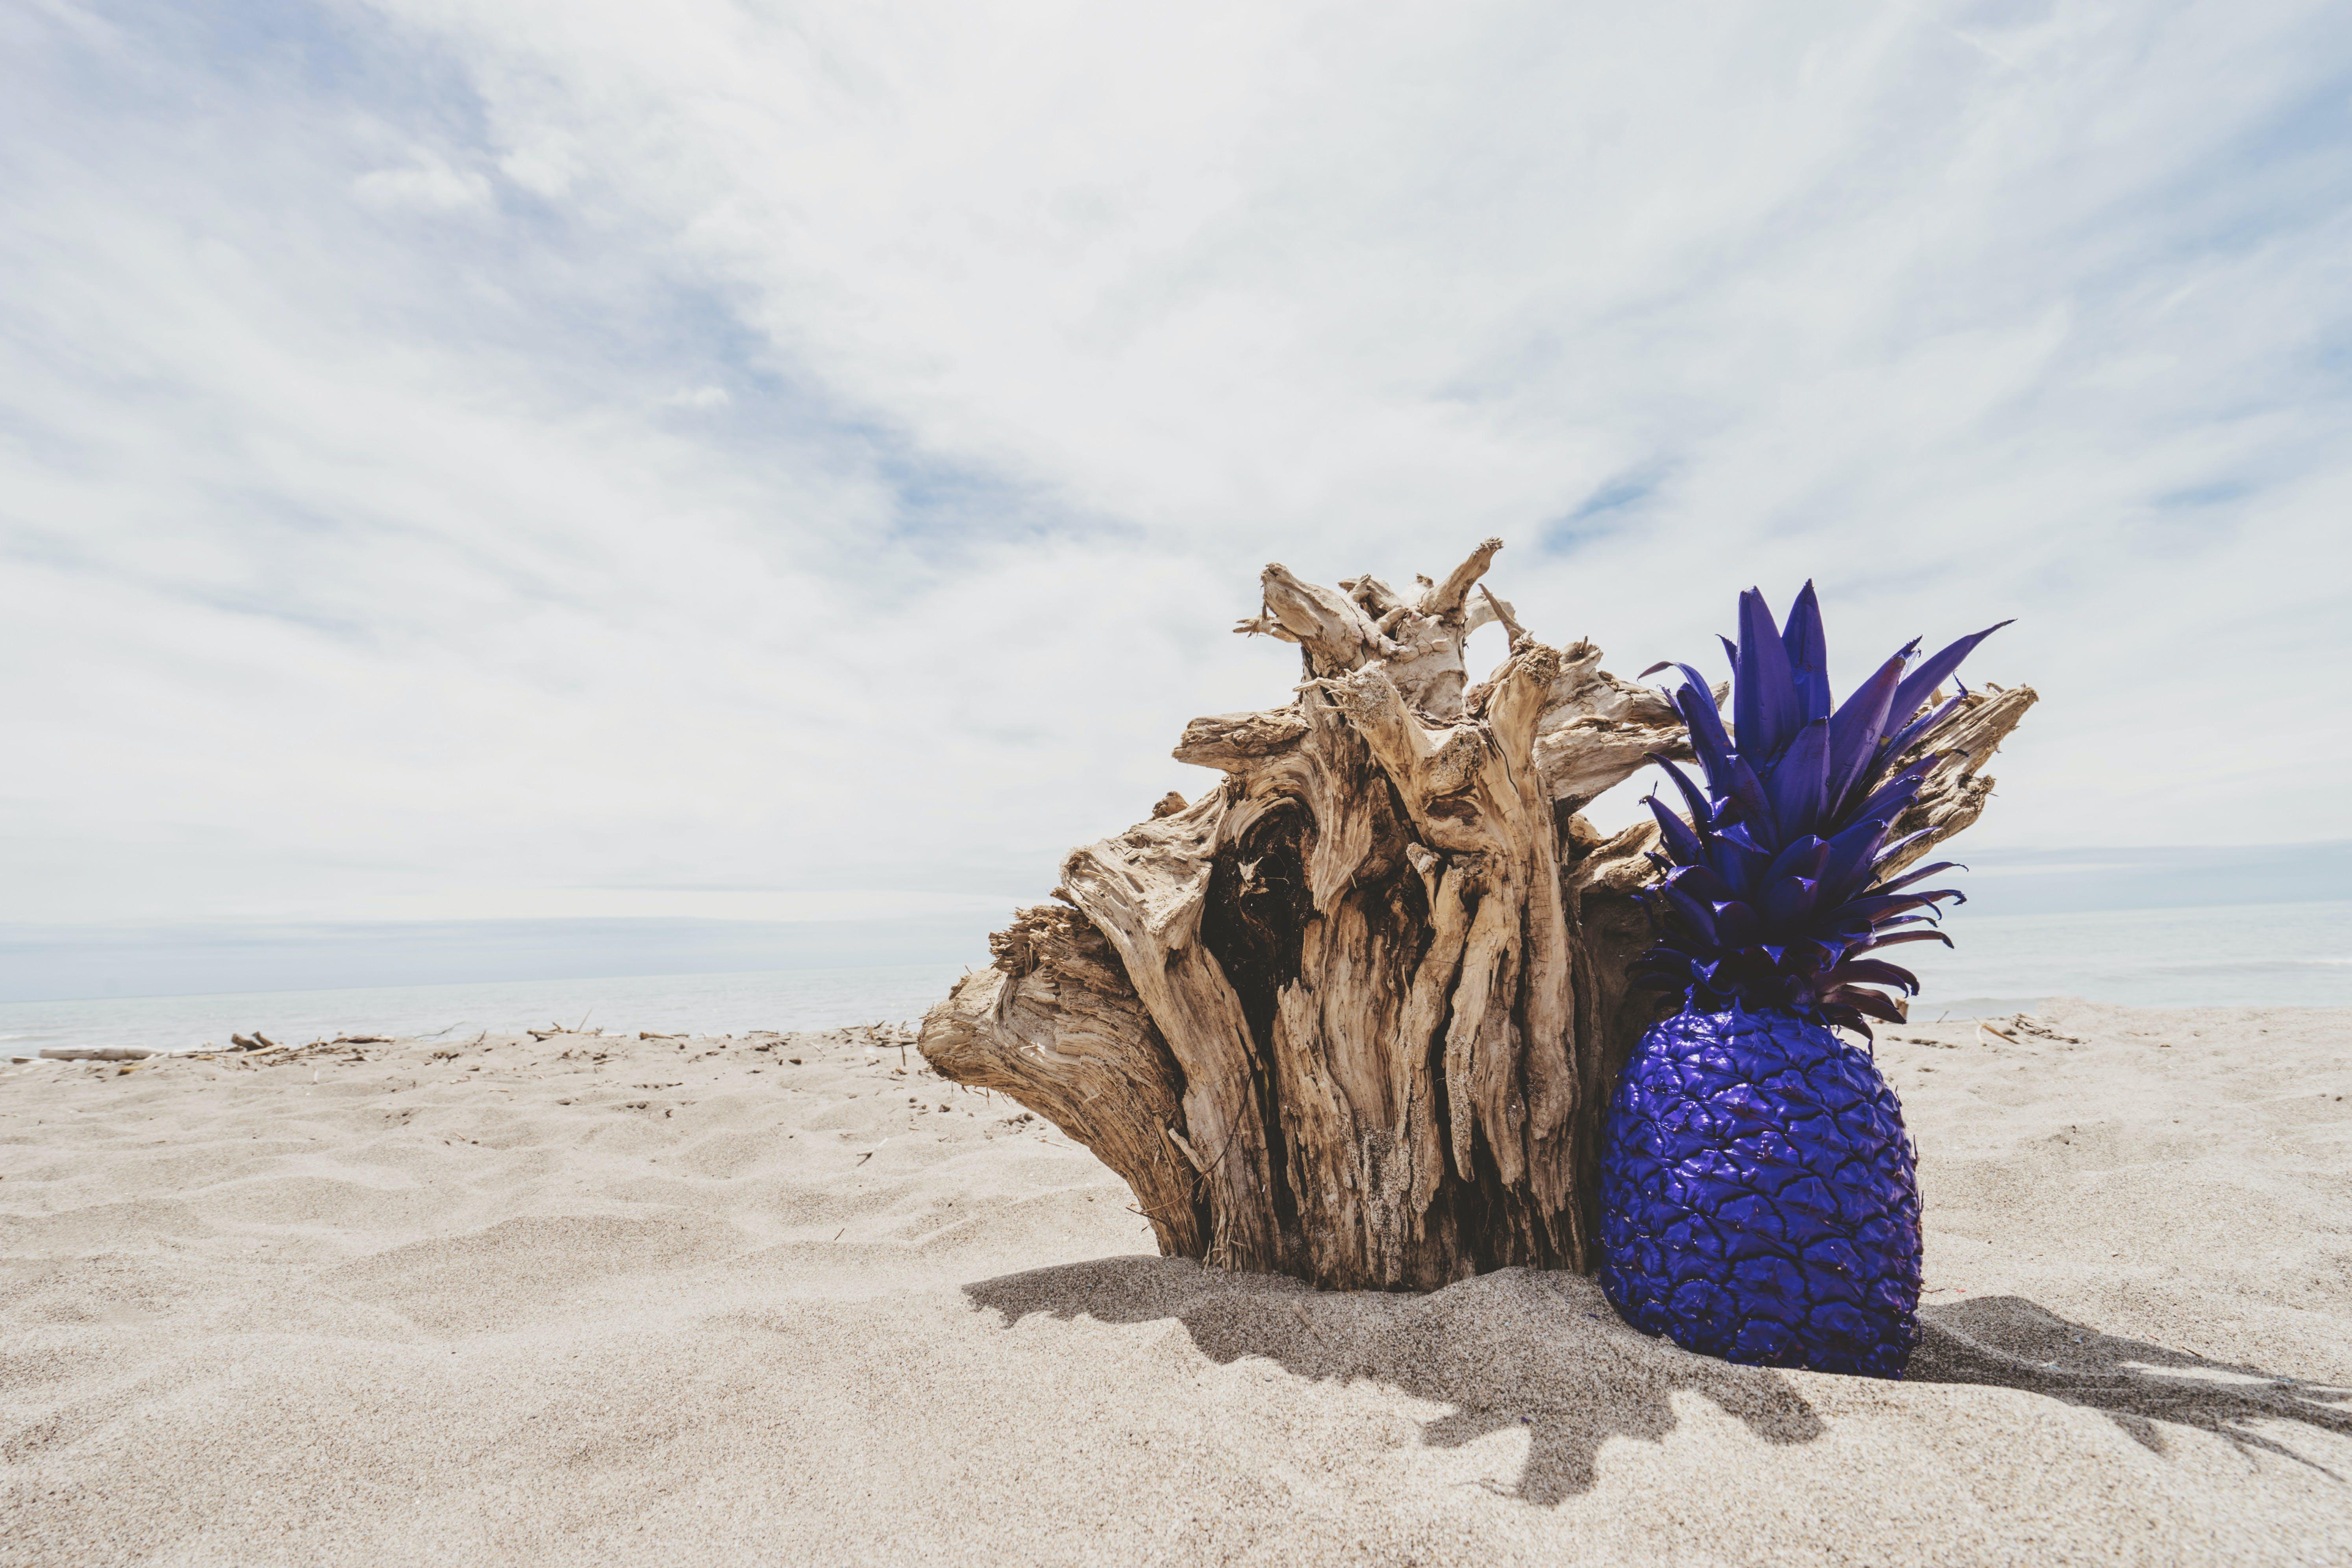 Free stock photo of wood, beach, sand, water